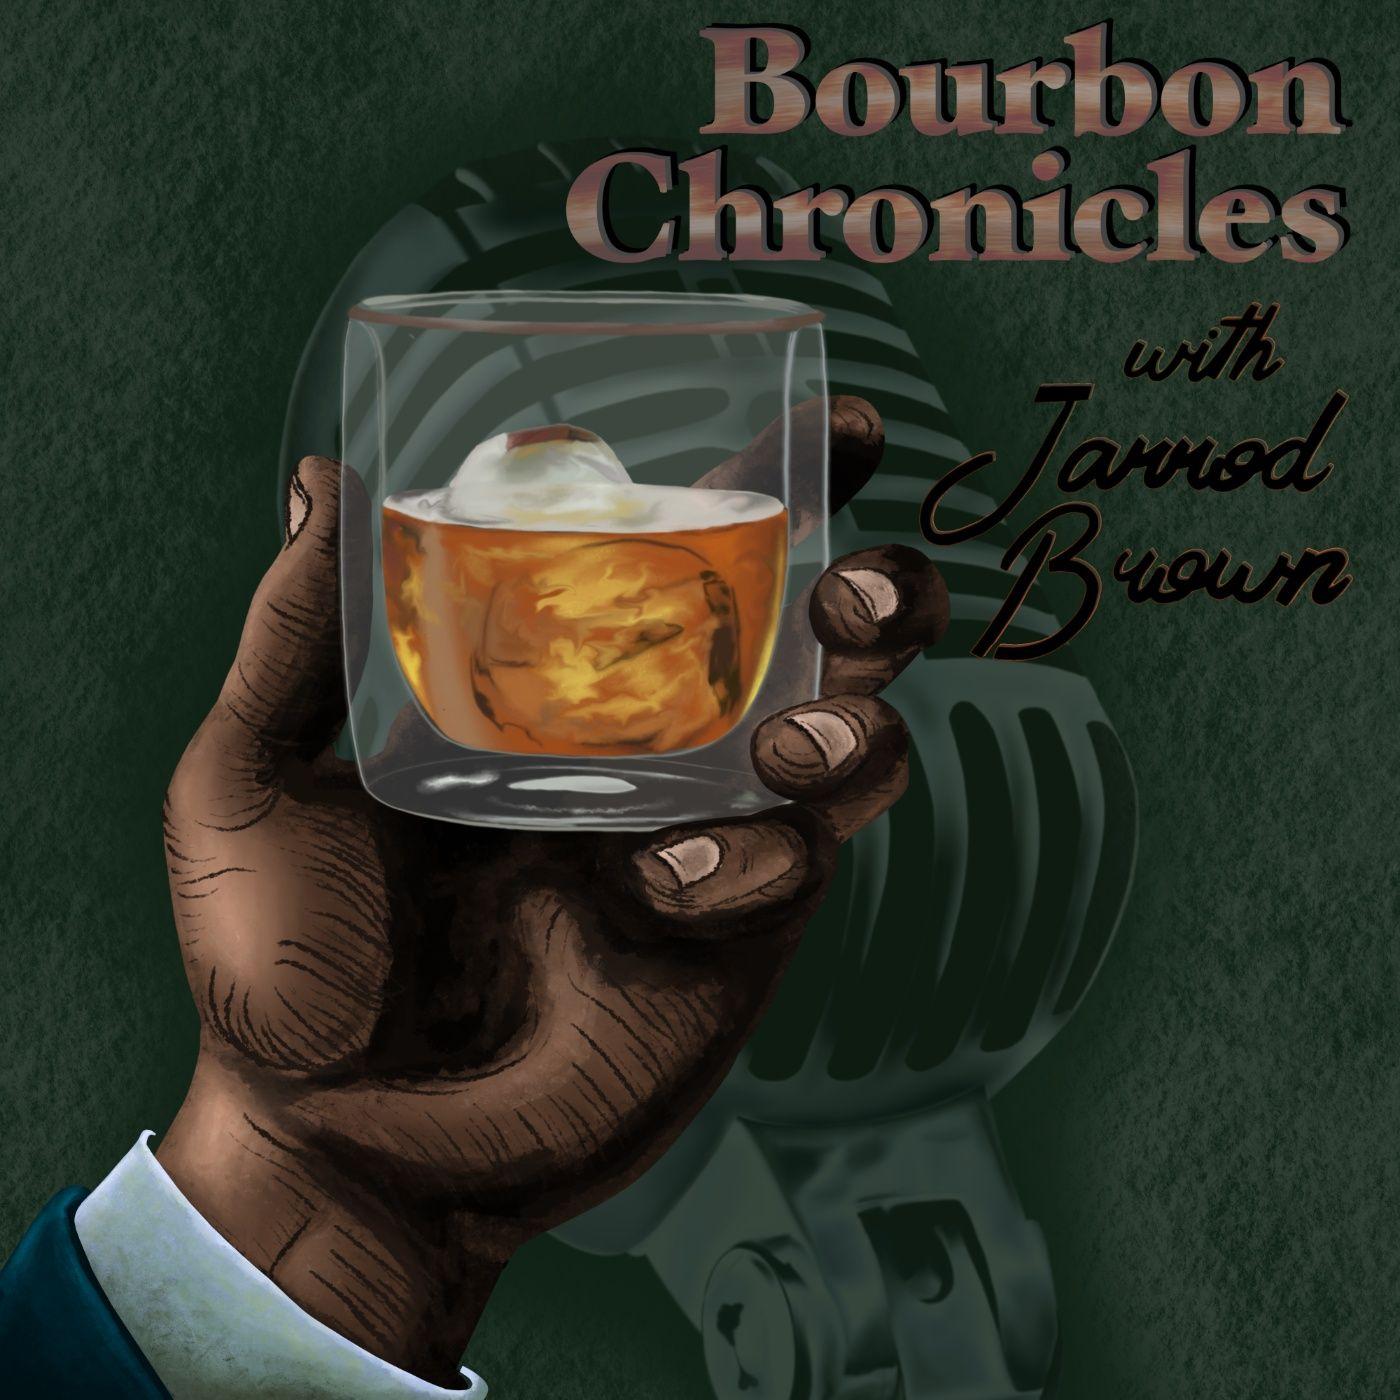 Bourbon Chronicles